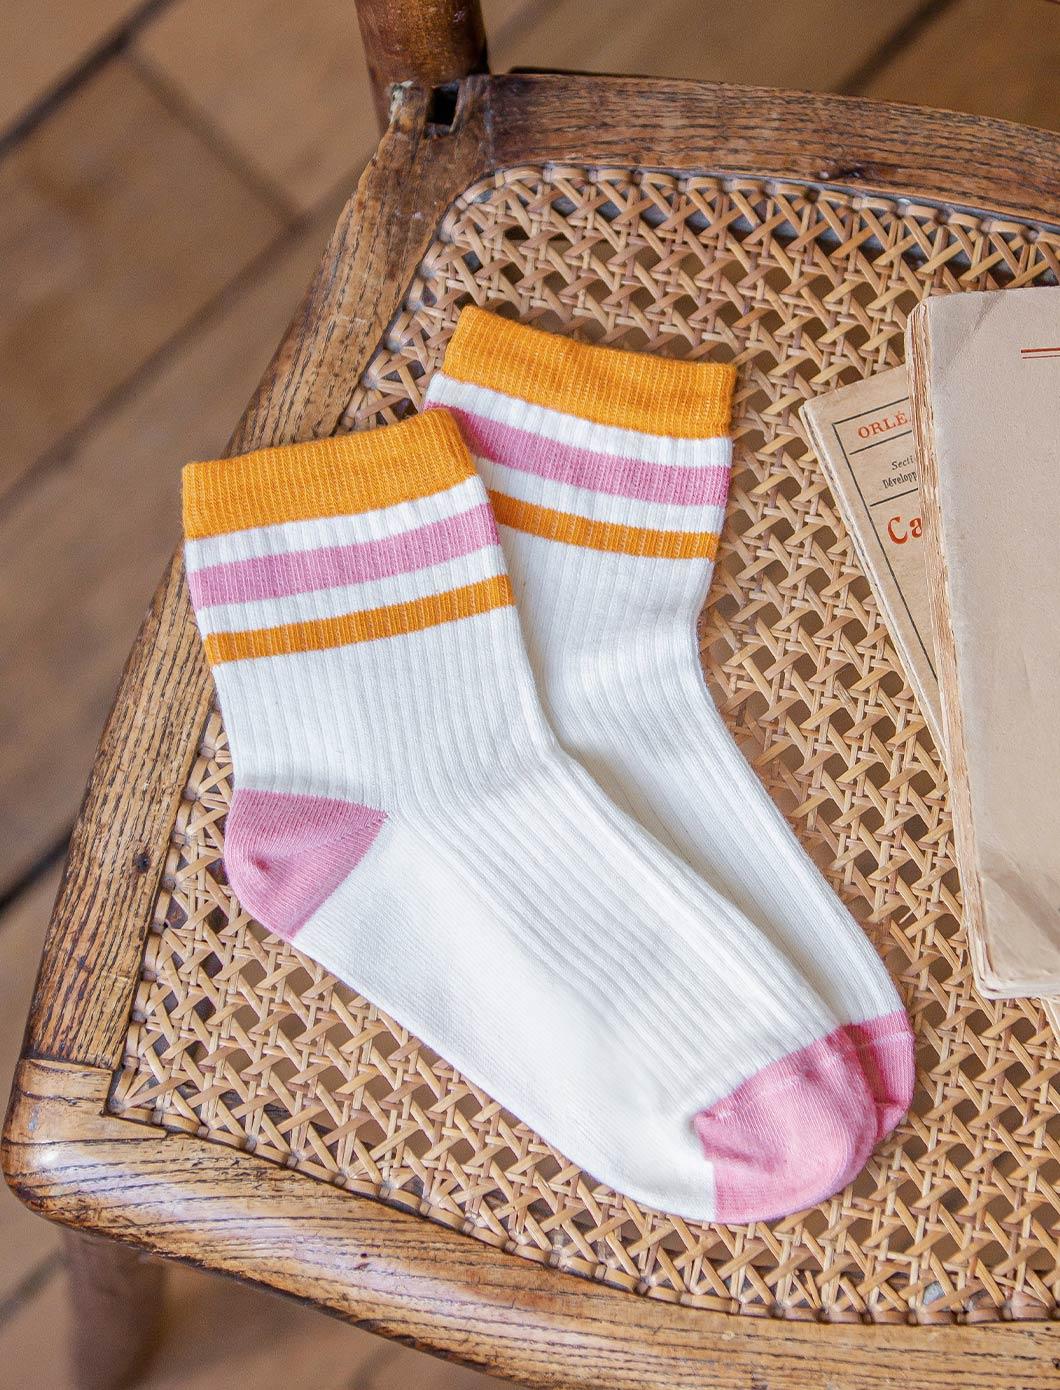 Sport Ribbed Socks - Ecru, Salmon and Mustard